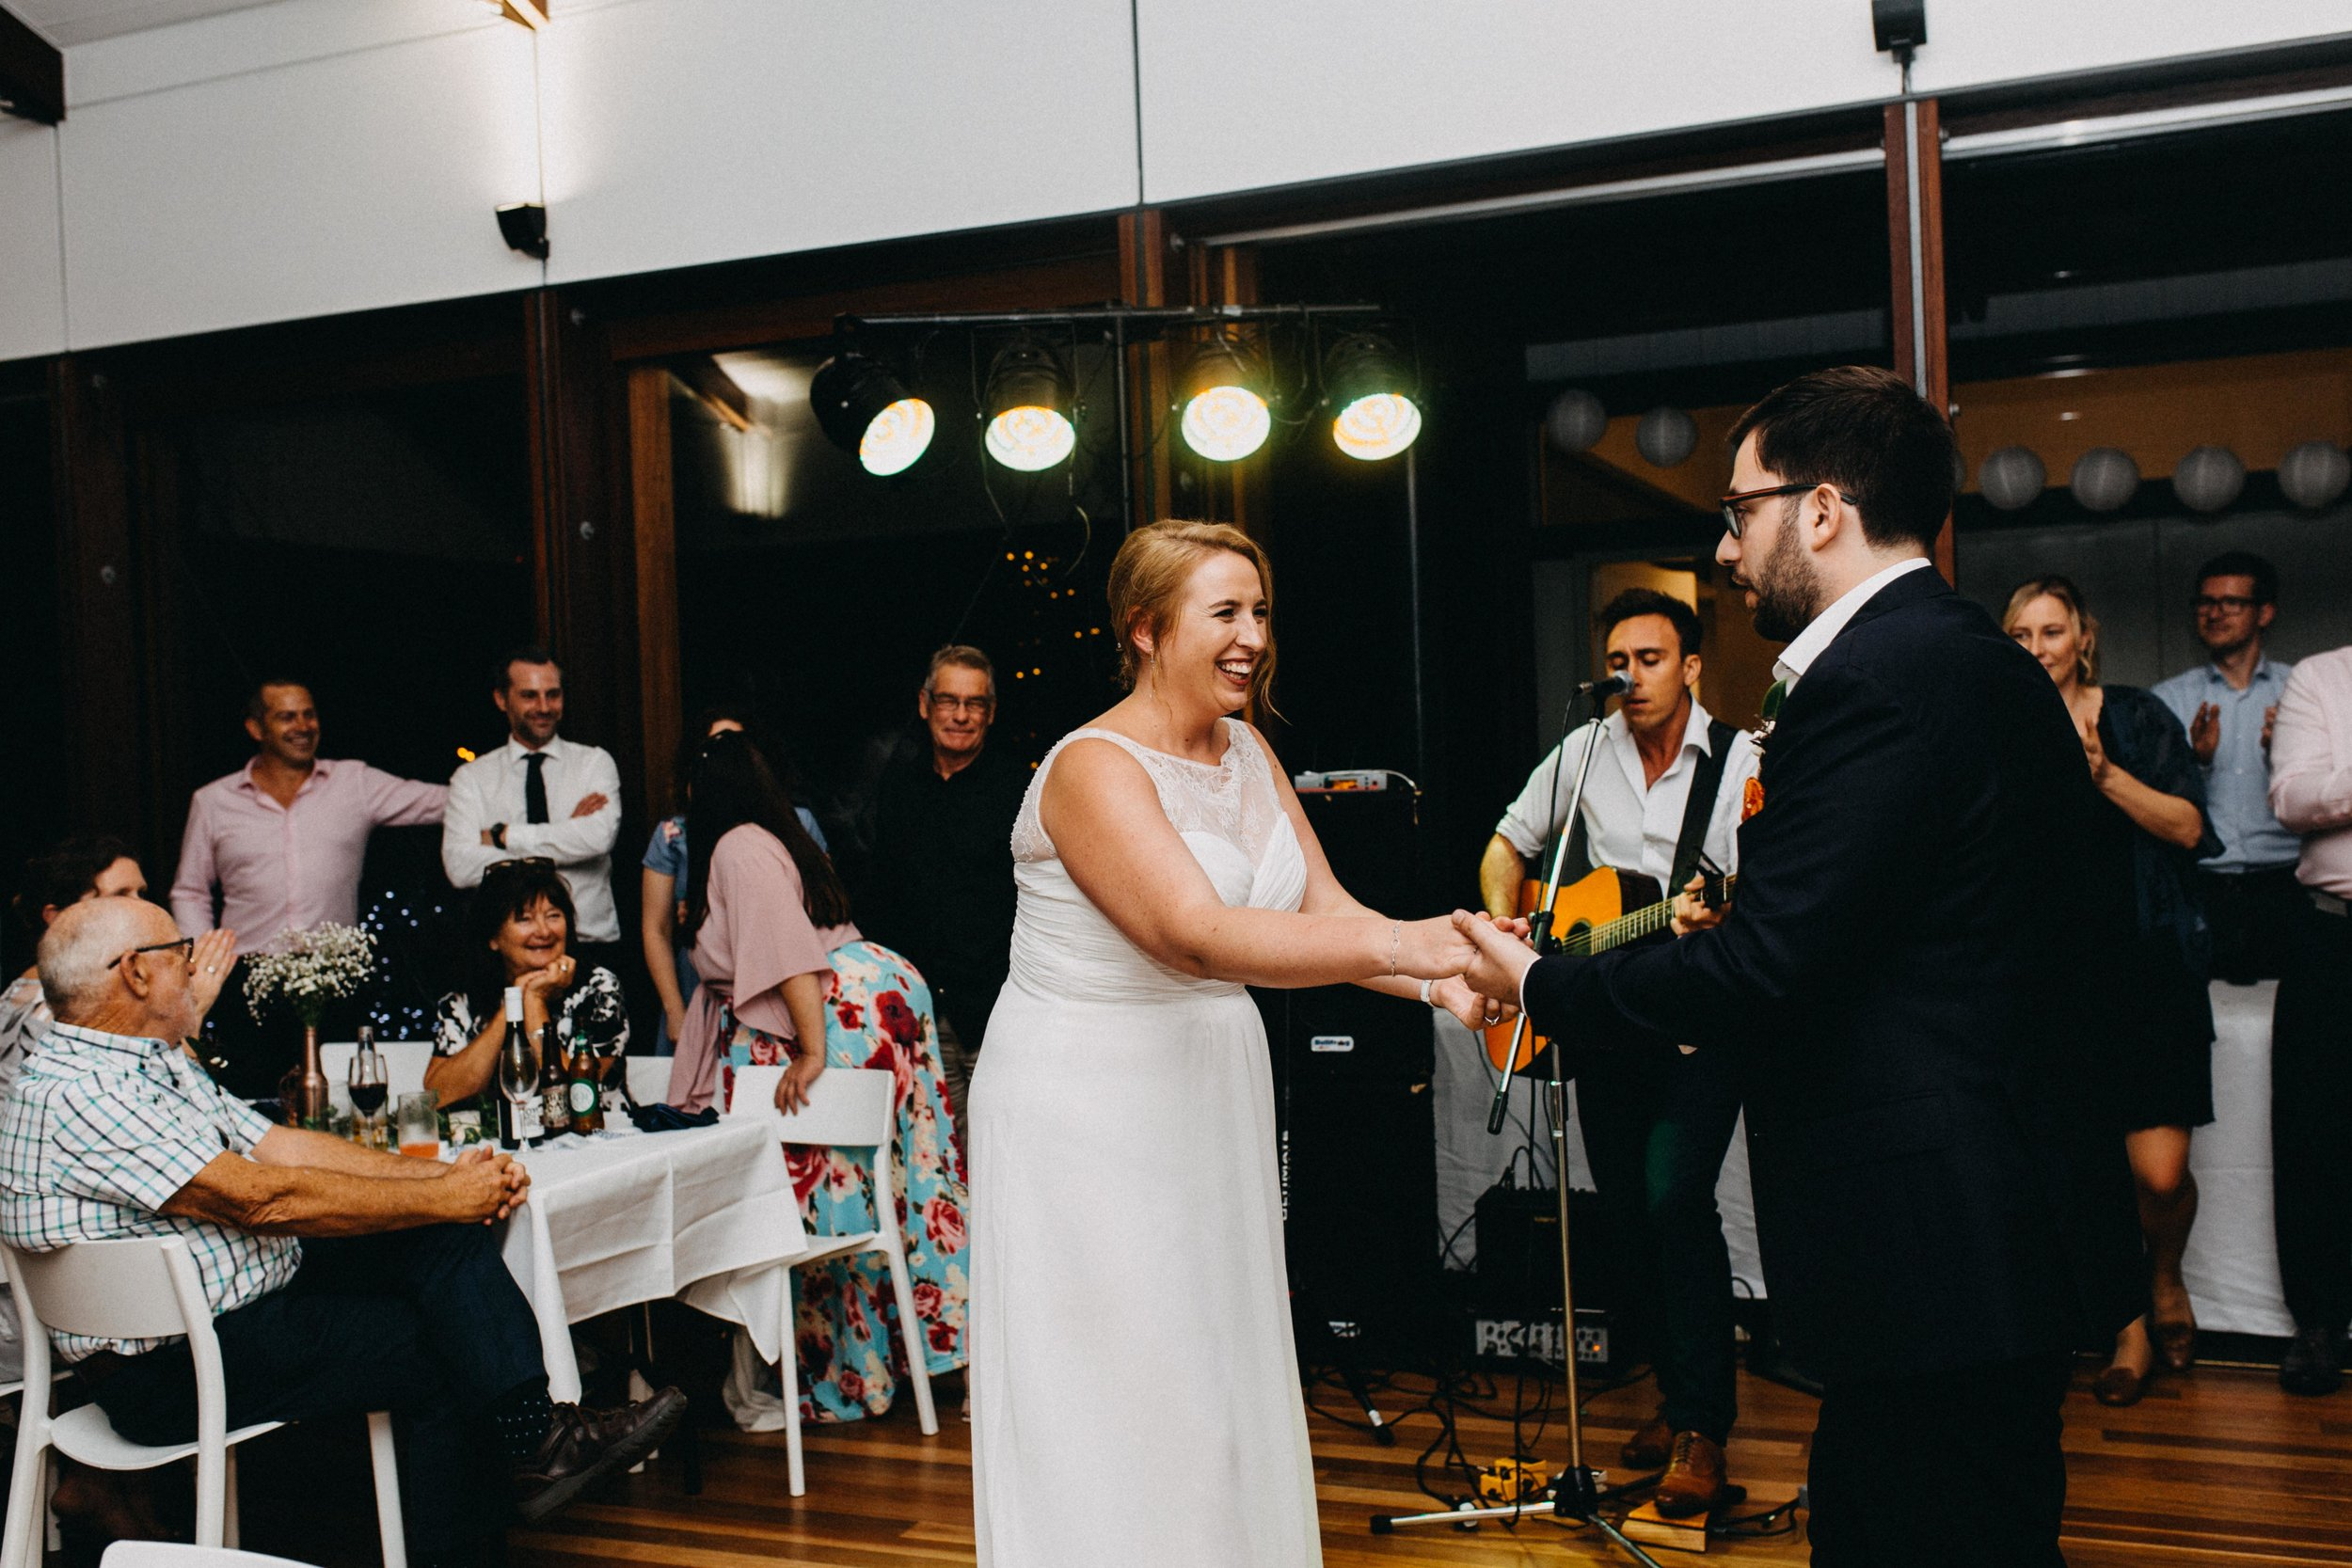 cabarita-park-sydney-wedding-emilyobrienphotography.net-91.jpg